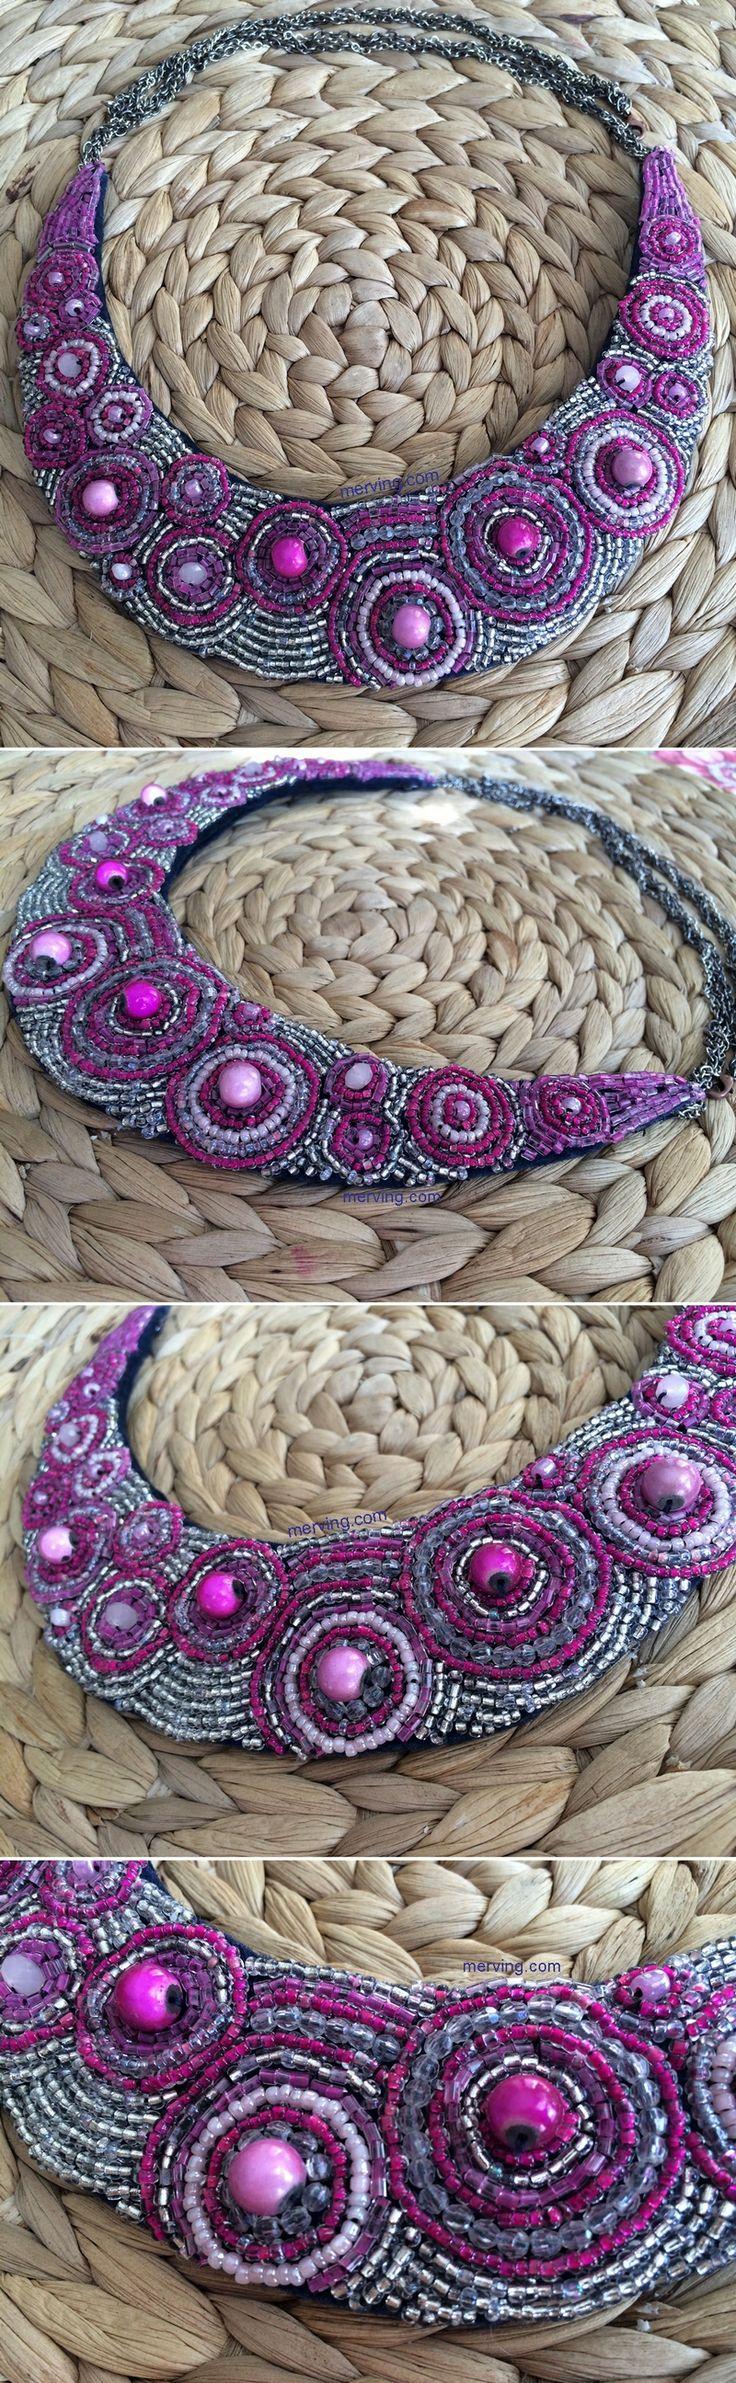 Merving Shop açılıyor...   www.merving.com #necklace #kolye #taslikolye #bignecklace #shop #sale #mervingdesign #mervingcom #mervingshop #like #handmade #diynecklace #blog #blogger #elyapimi #handmade  #fashion #fashionnecklace #fashion #pinknecklace #purple